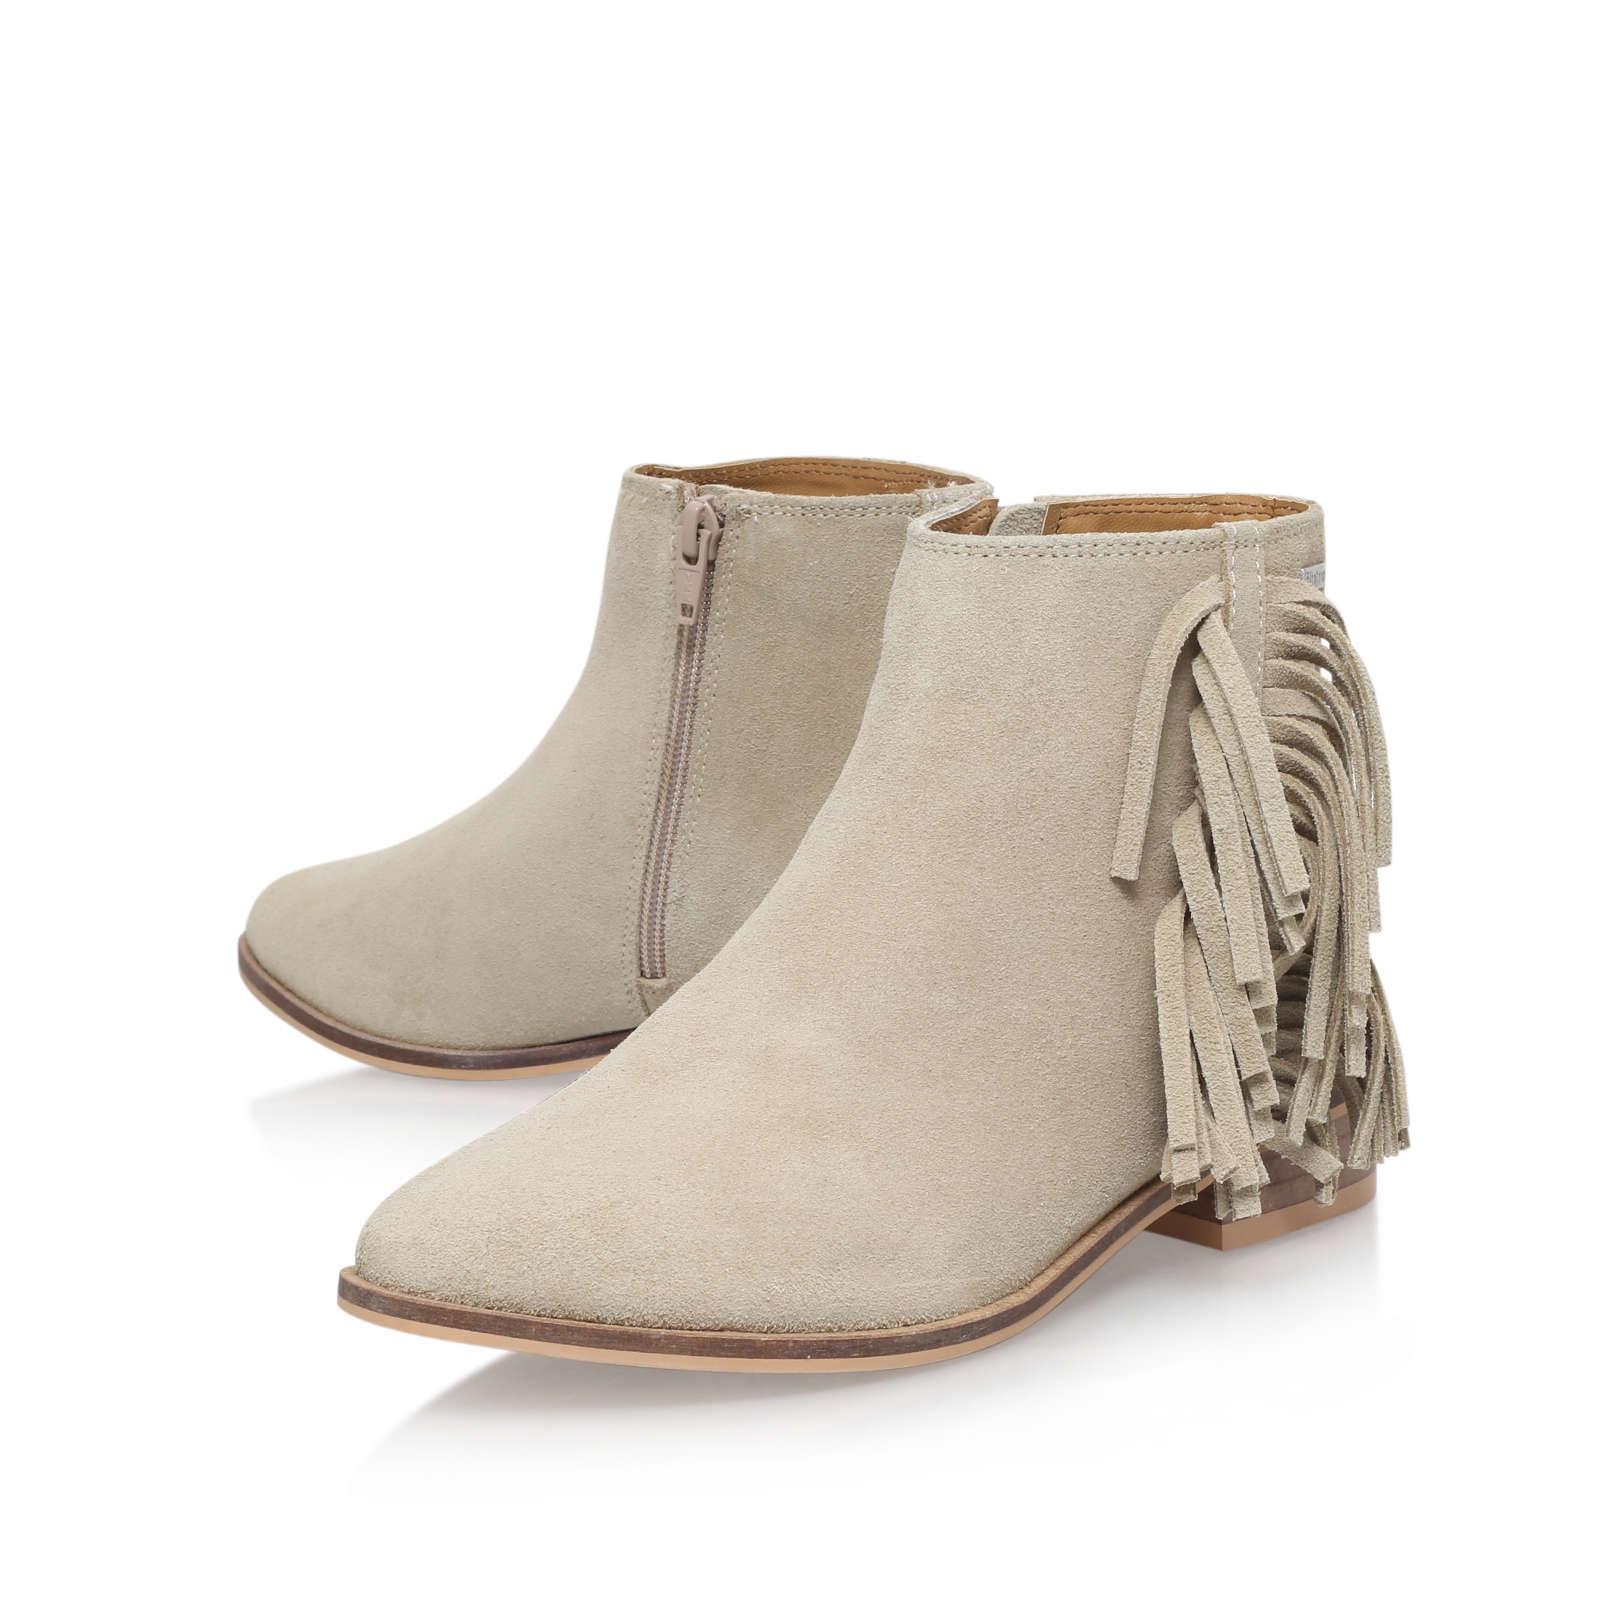 suede tassle ankle boot firetrap suede tassle beige suede flat ankle boots by firetrap. Black Bedroom Furniture Sets. Home Design Ideas